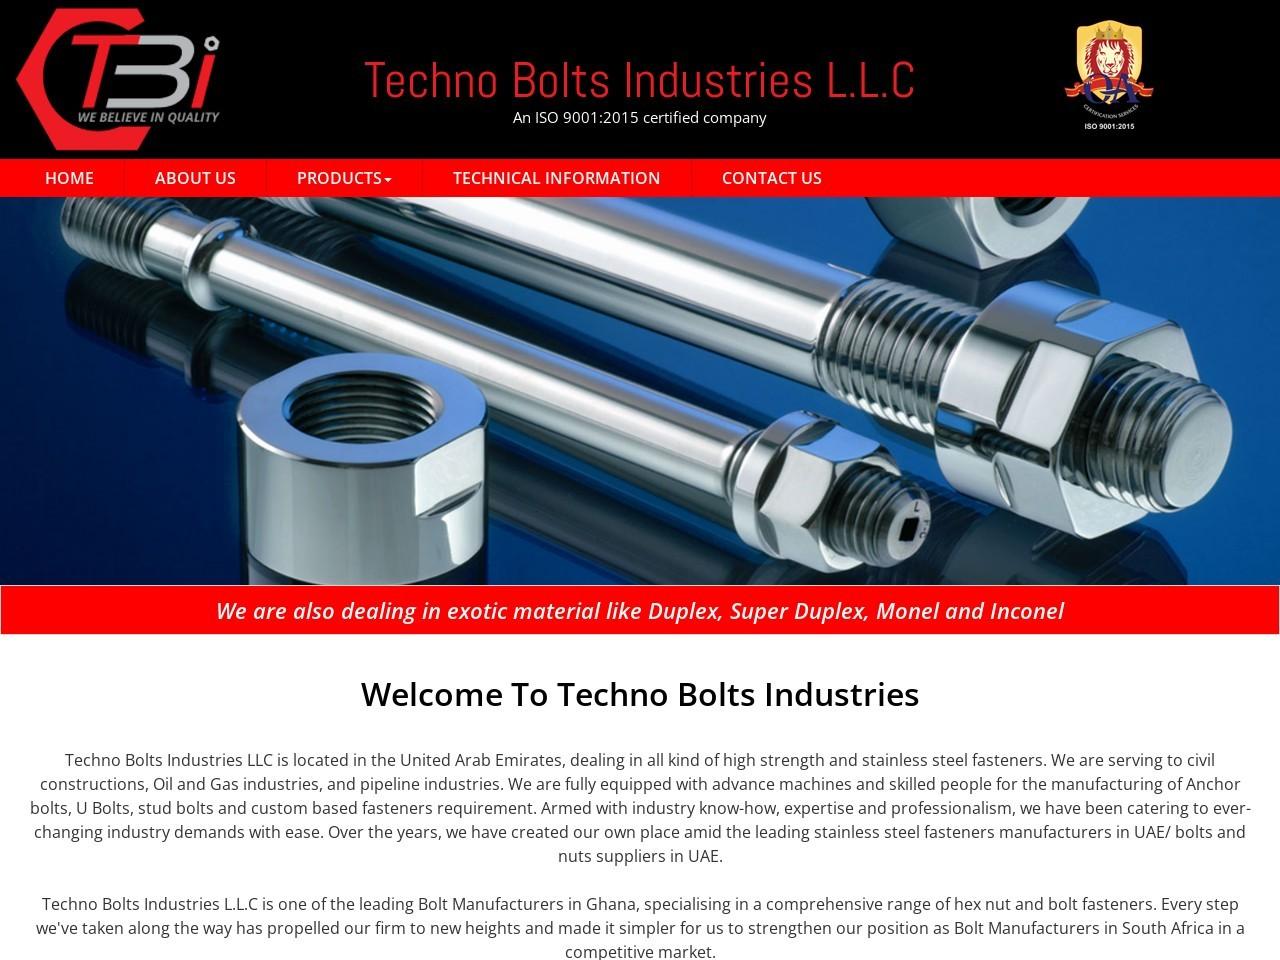 Hex Bolt Manufacturer and Supplier in UAE